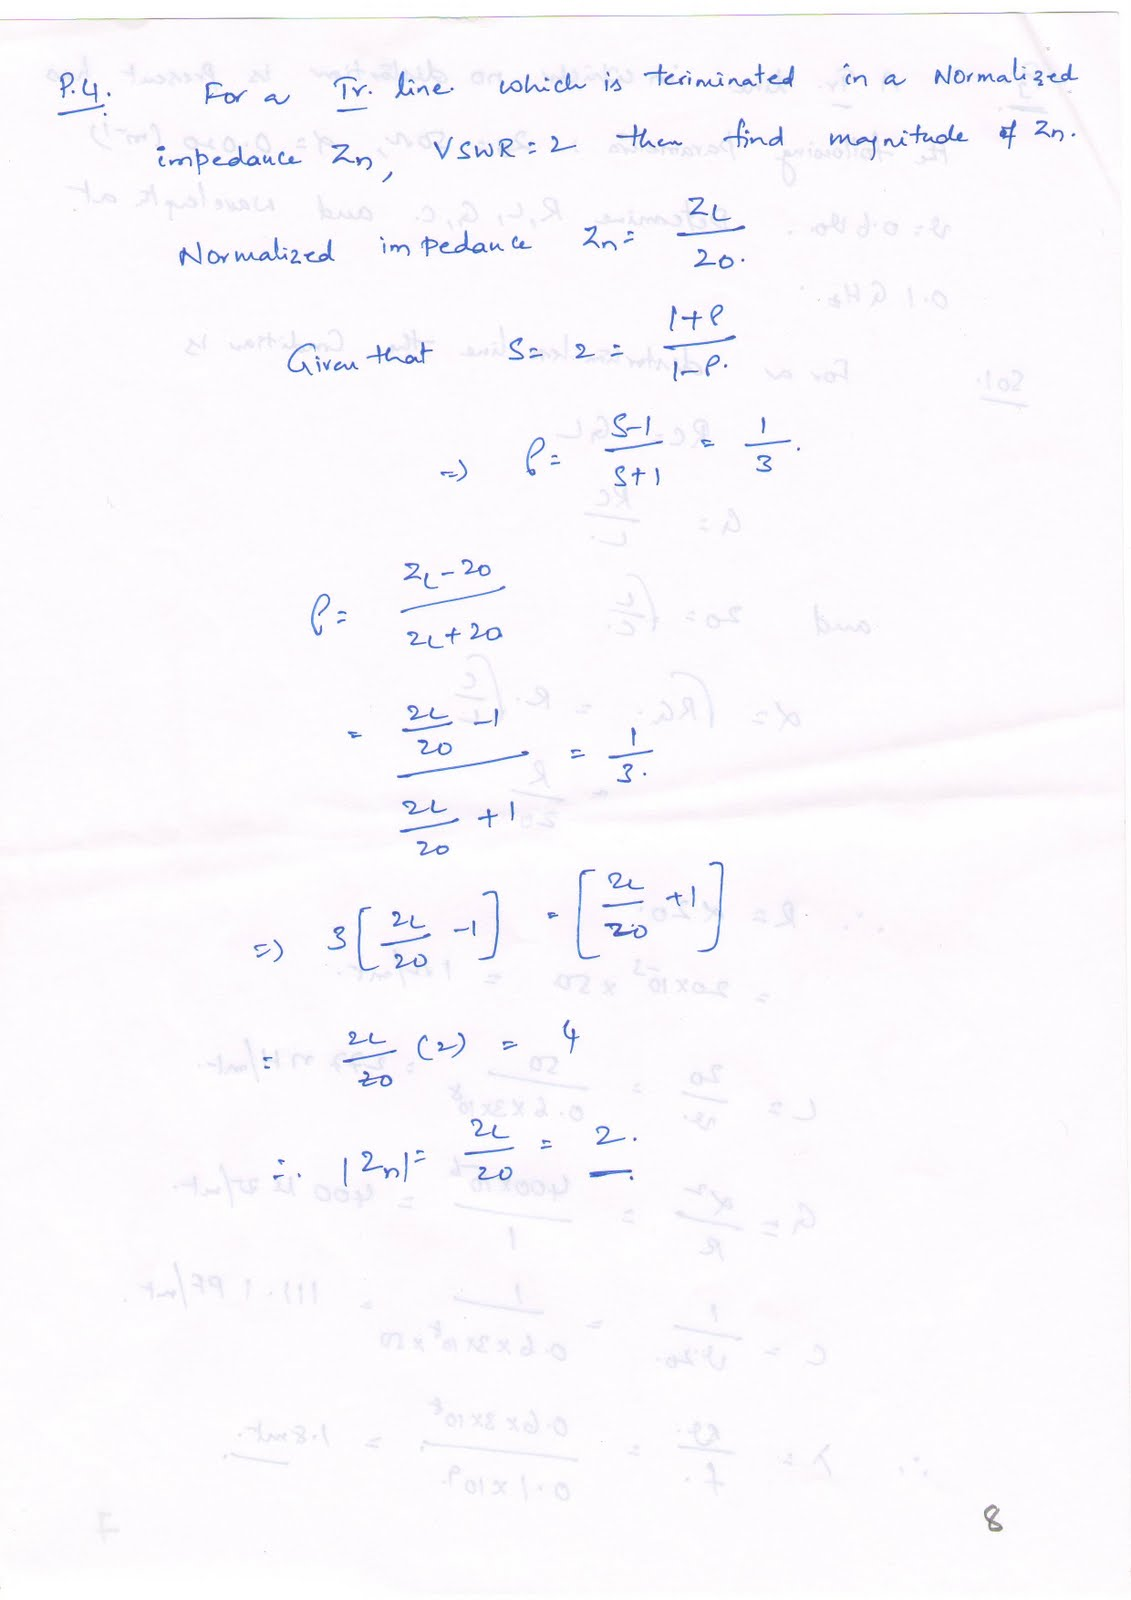 Bvrit Ece Rockers 08 12 Emtl Tx2 Notes